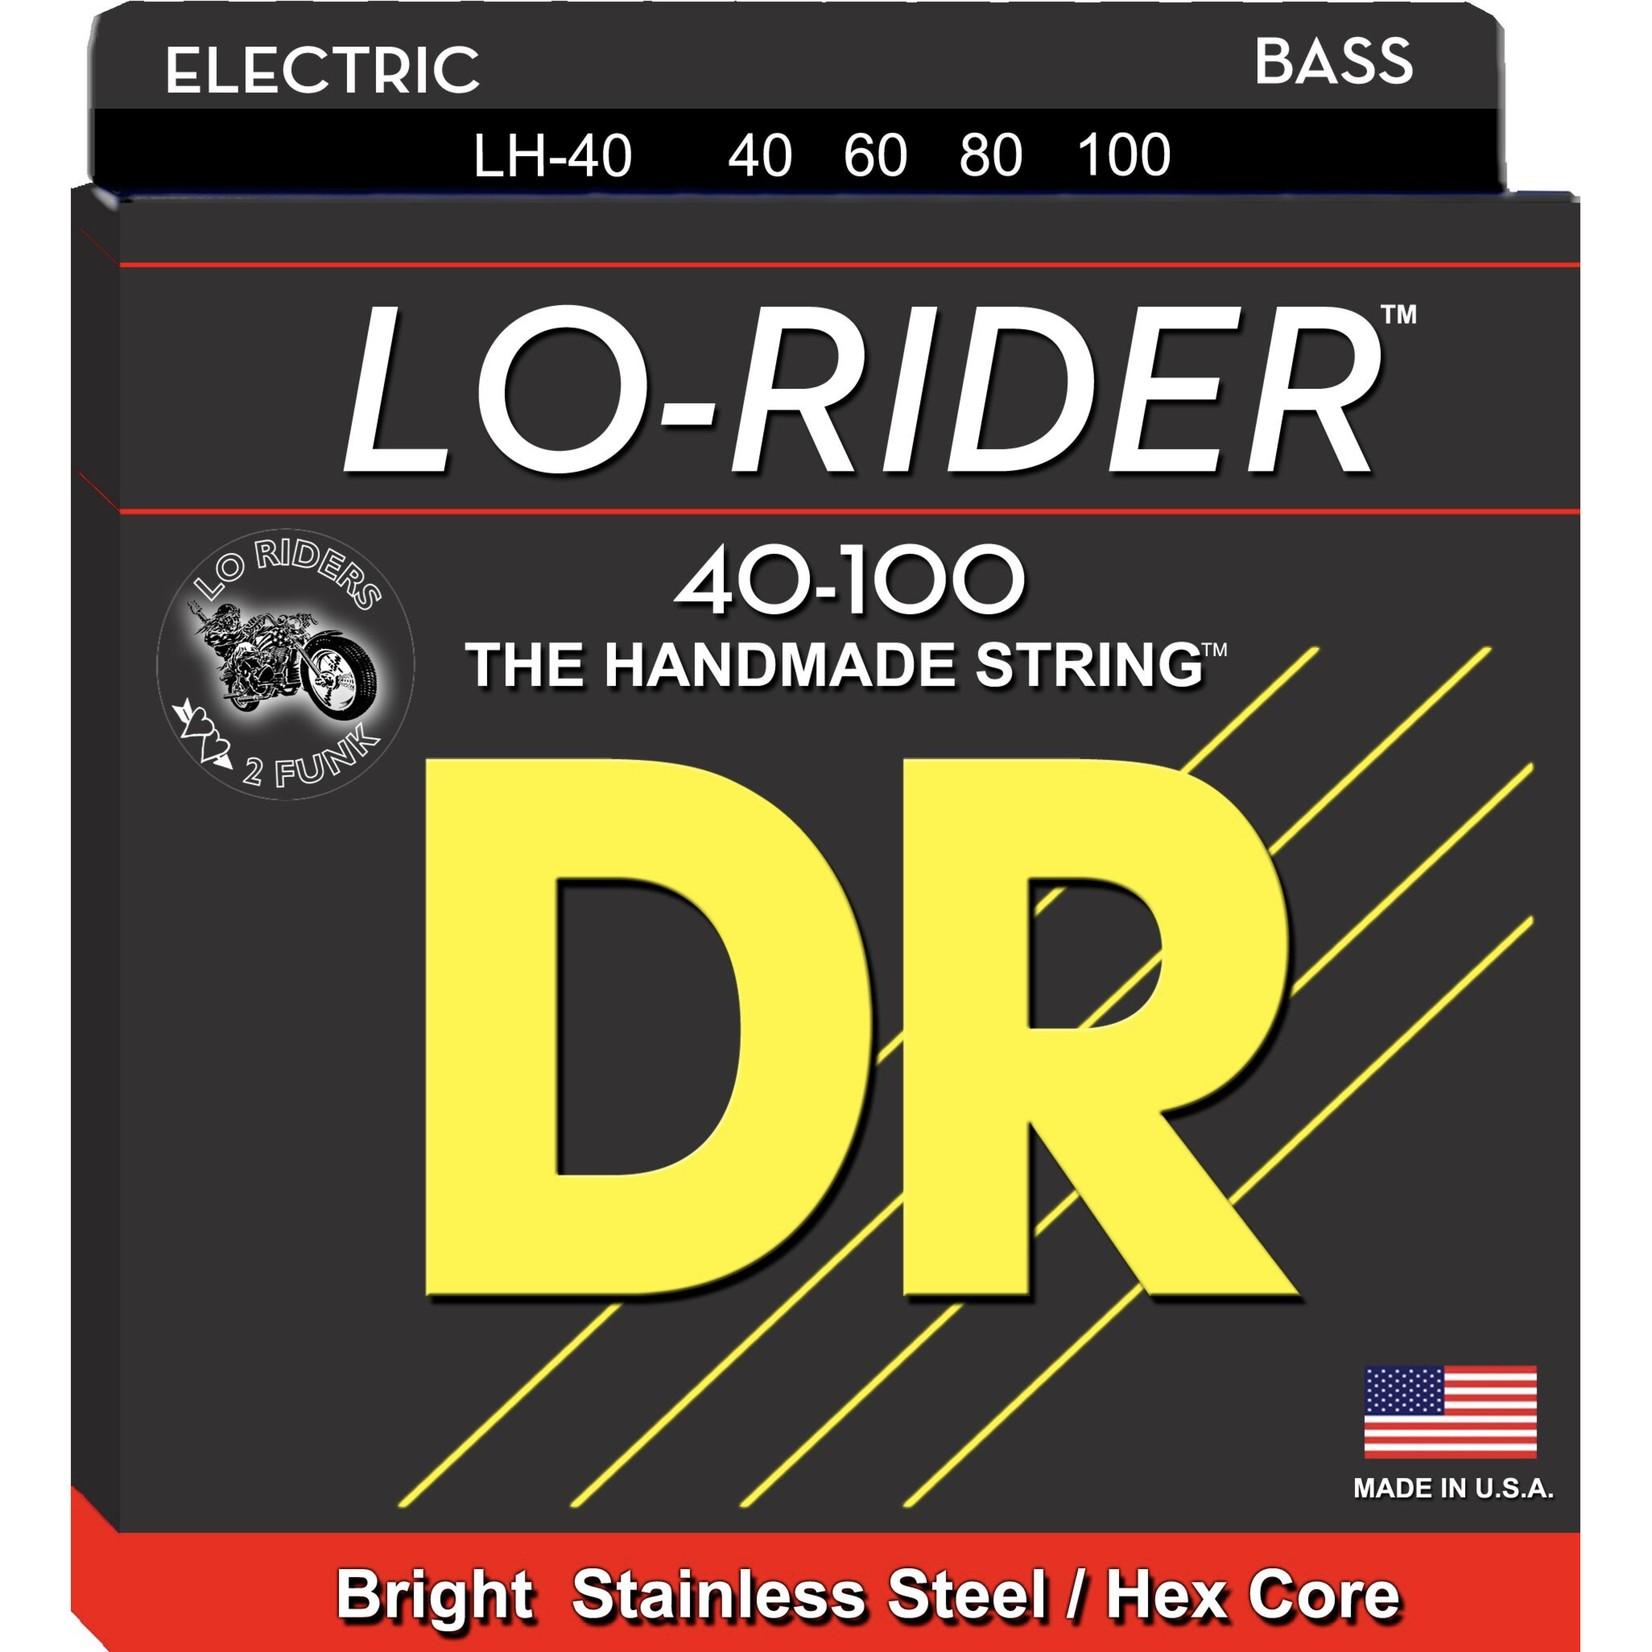 DR Strings DR Strings LO-RIDERª - Stainless Steel Bass Strings: Light 40-100, LH-40